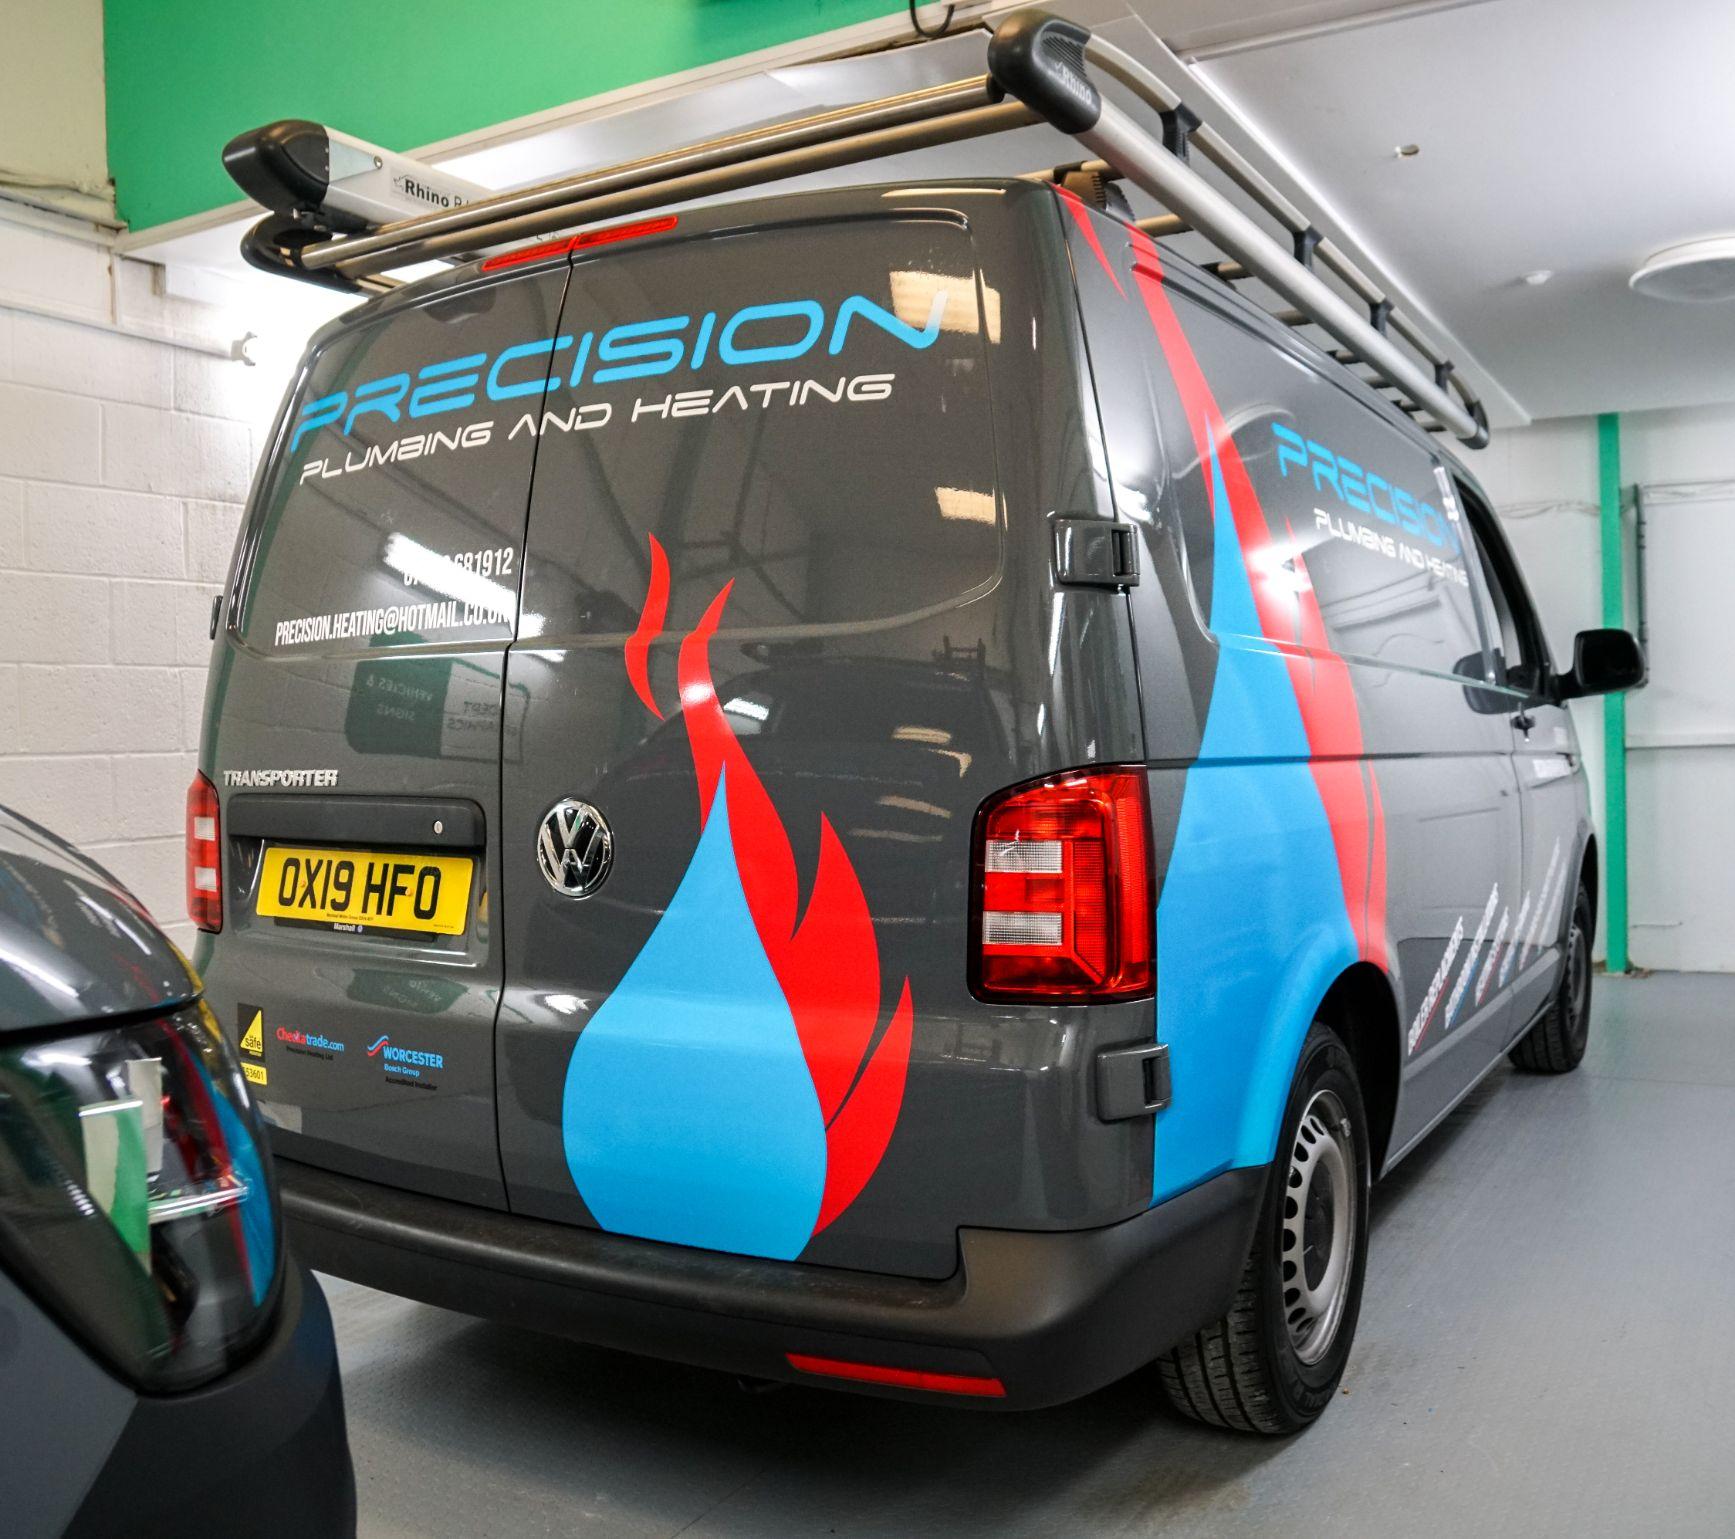 van with a fresh wrap